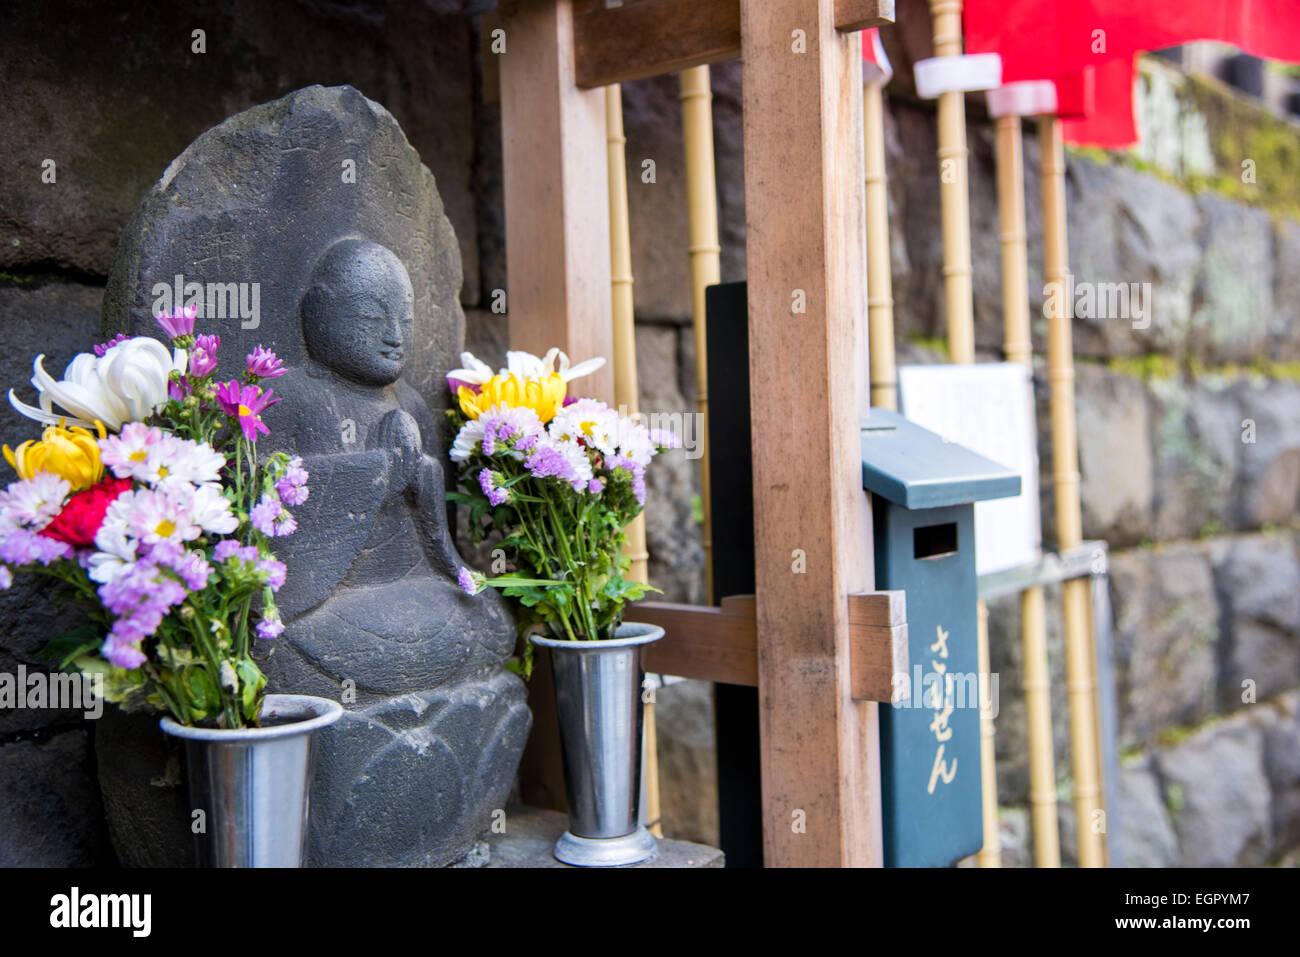 Ume Festival, Yushima Tenmangu, Bunkyo-Ku, Tokyo, Japan Stockbild